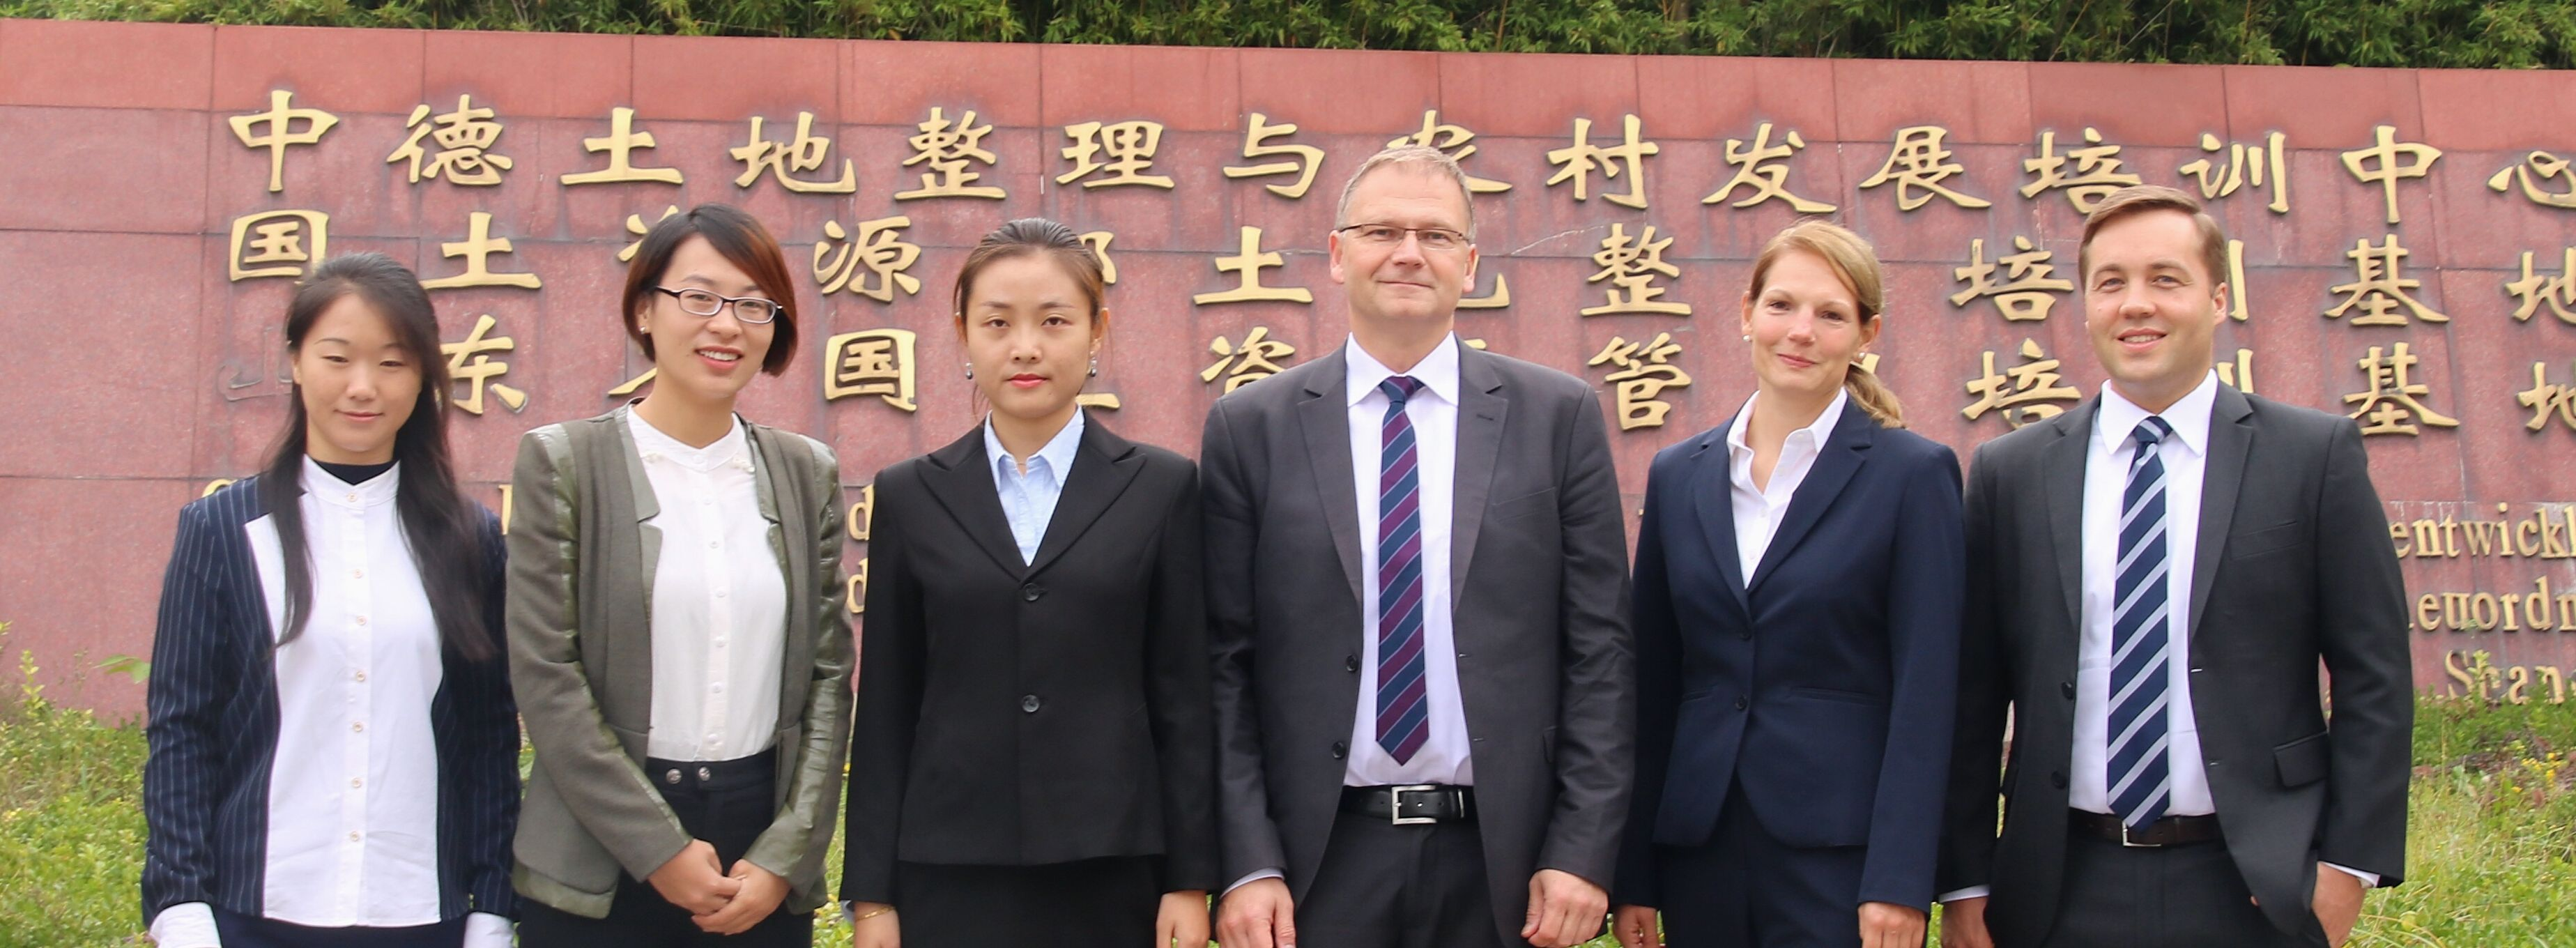 Li Cuiyun, Yang Hong, Zhang Wenjun, Dr. Michael Klaus, Melanie Kade, Sebastian Kade